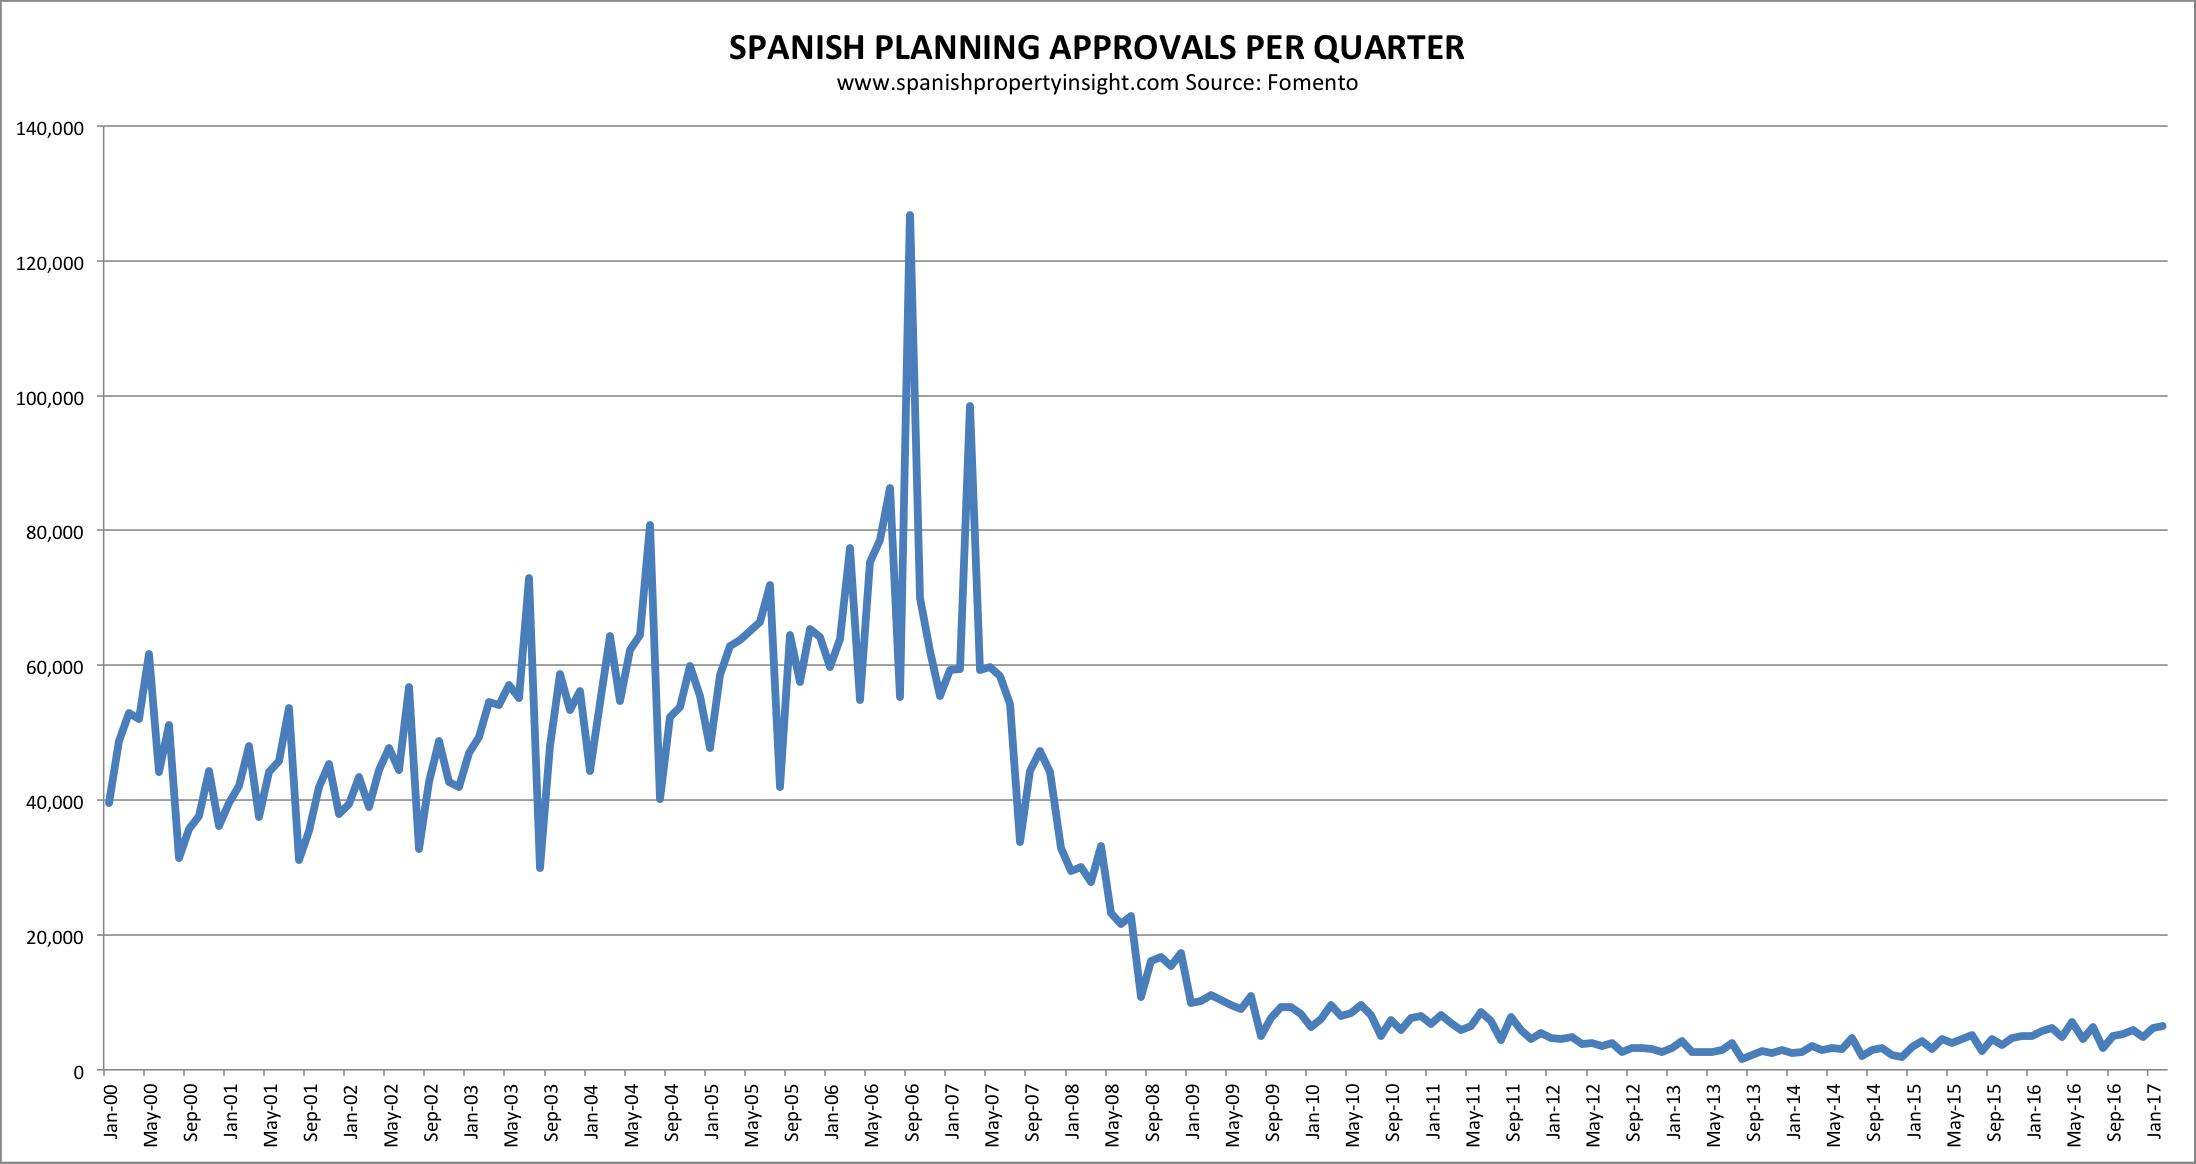 spanish housing starts in Spain